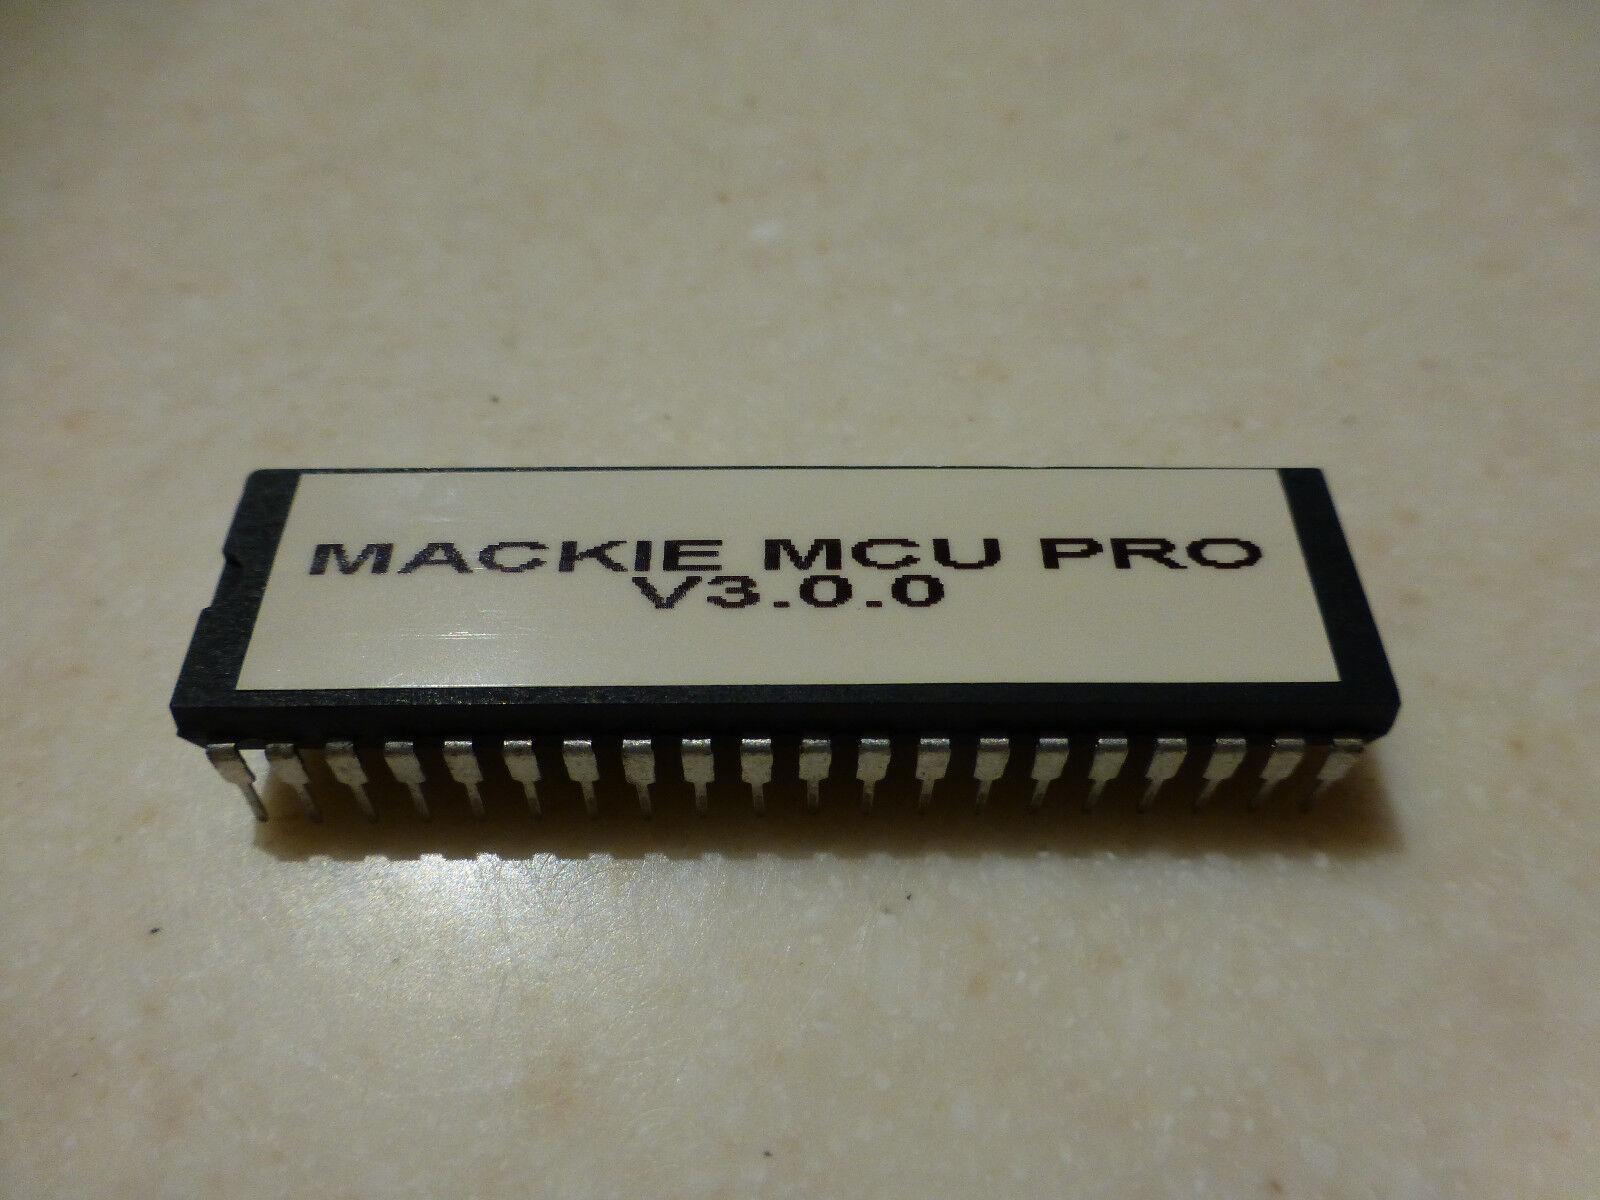 Mackie control universal pro emagic logic control XT firmware update  p v3.0.0